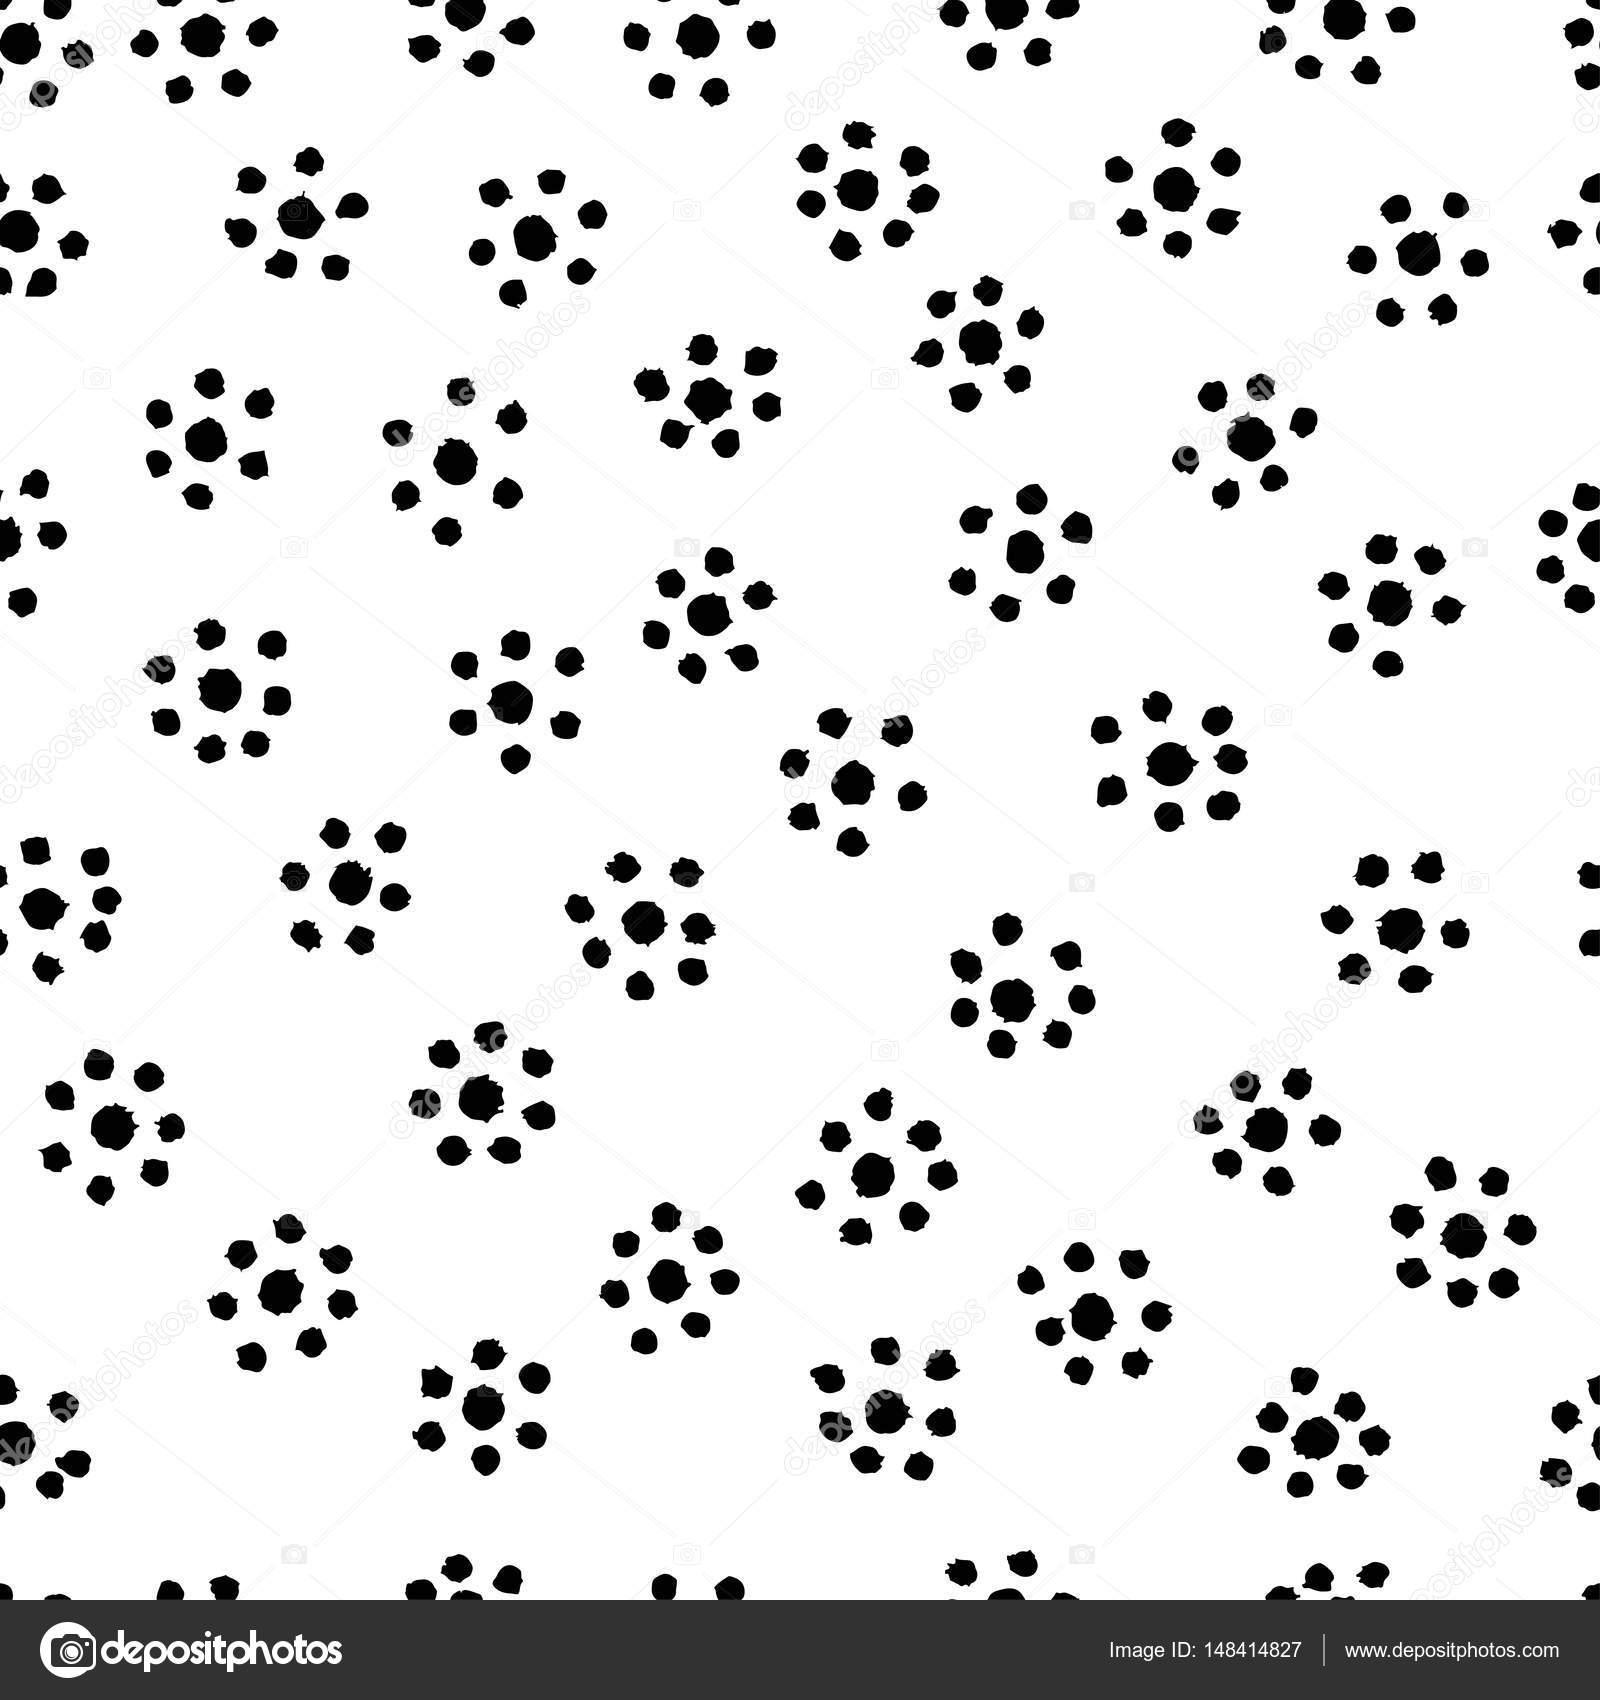 Tarjeta de patrones sin fisuras — Vector de stock © YuliyaKim #148414827